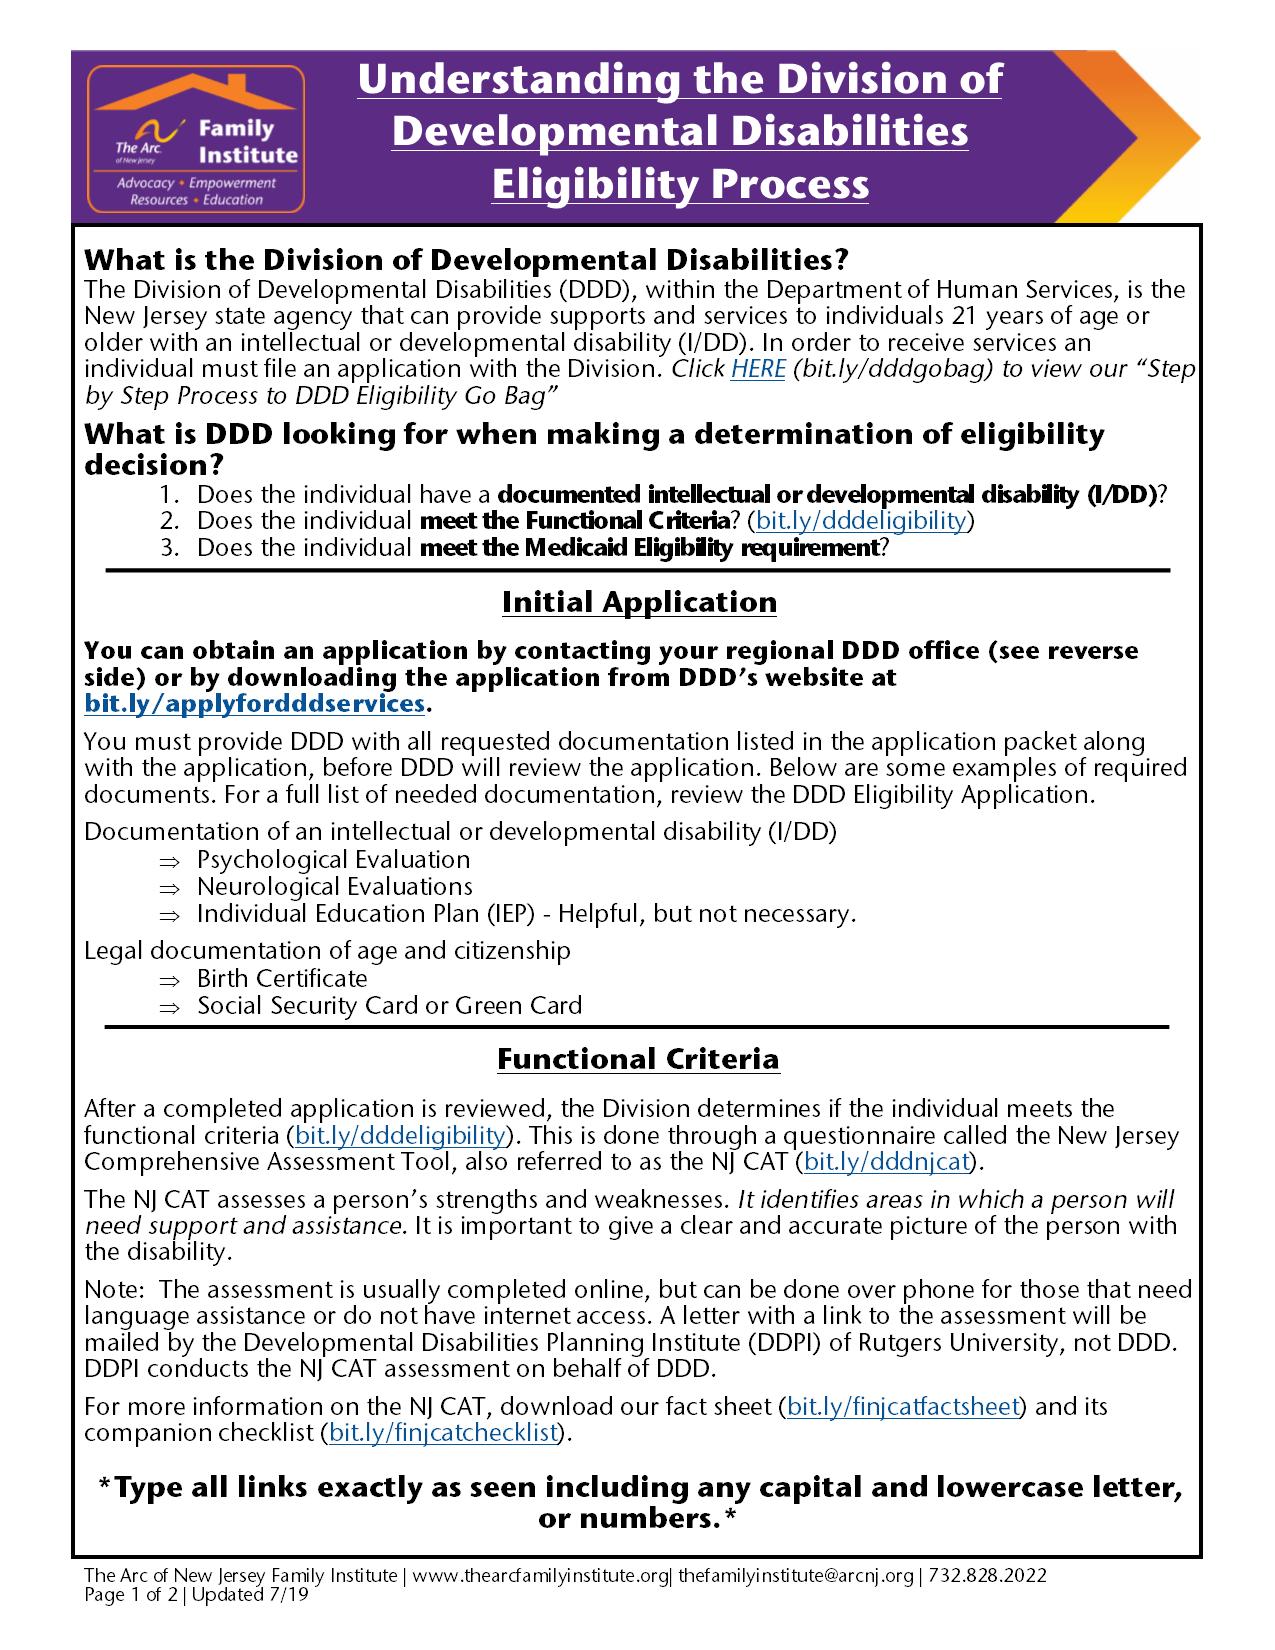 Understanding DDD's Determination of Eligibility Process - English